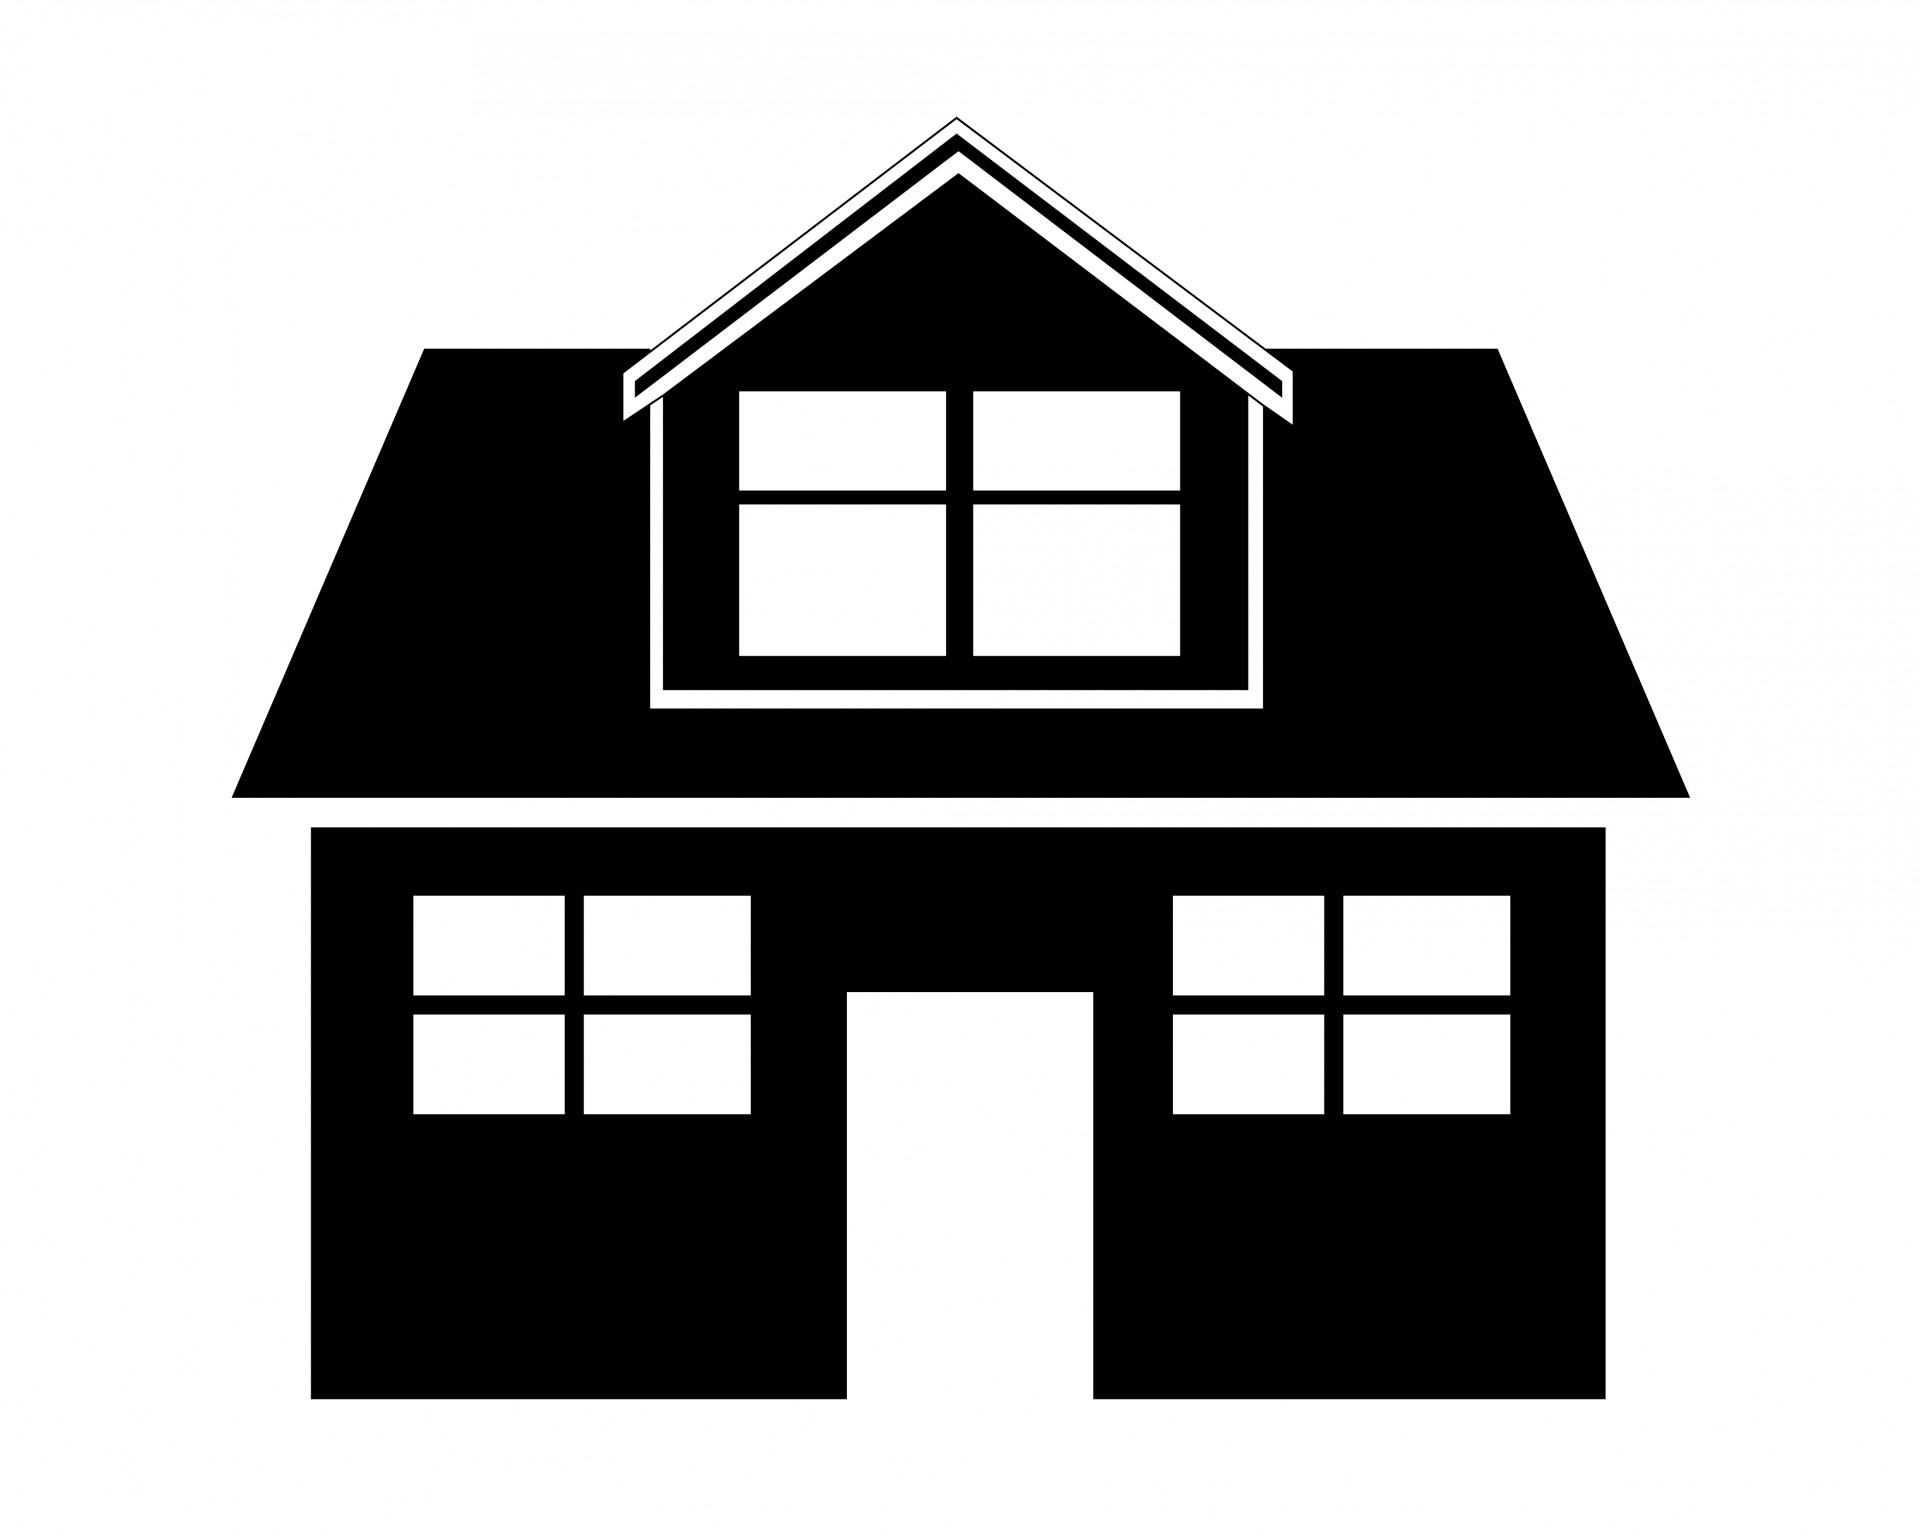 House Clipart-House Clipart-12